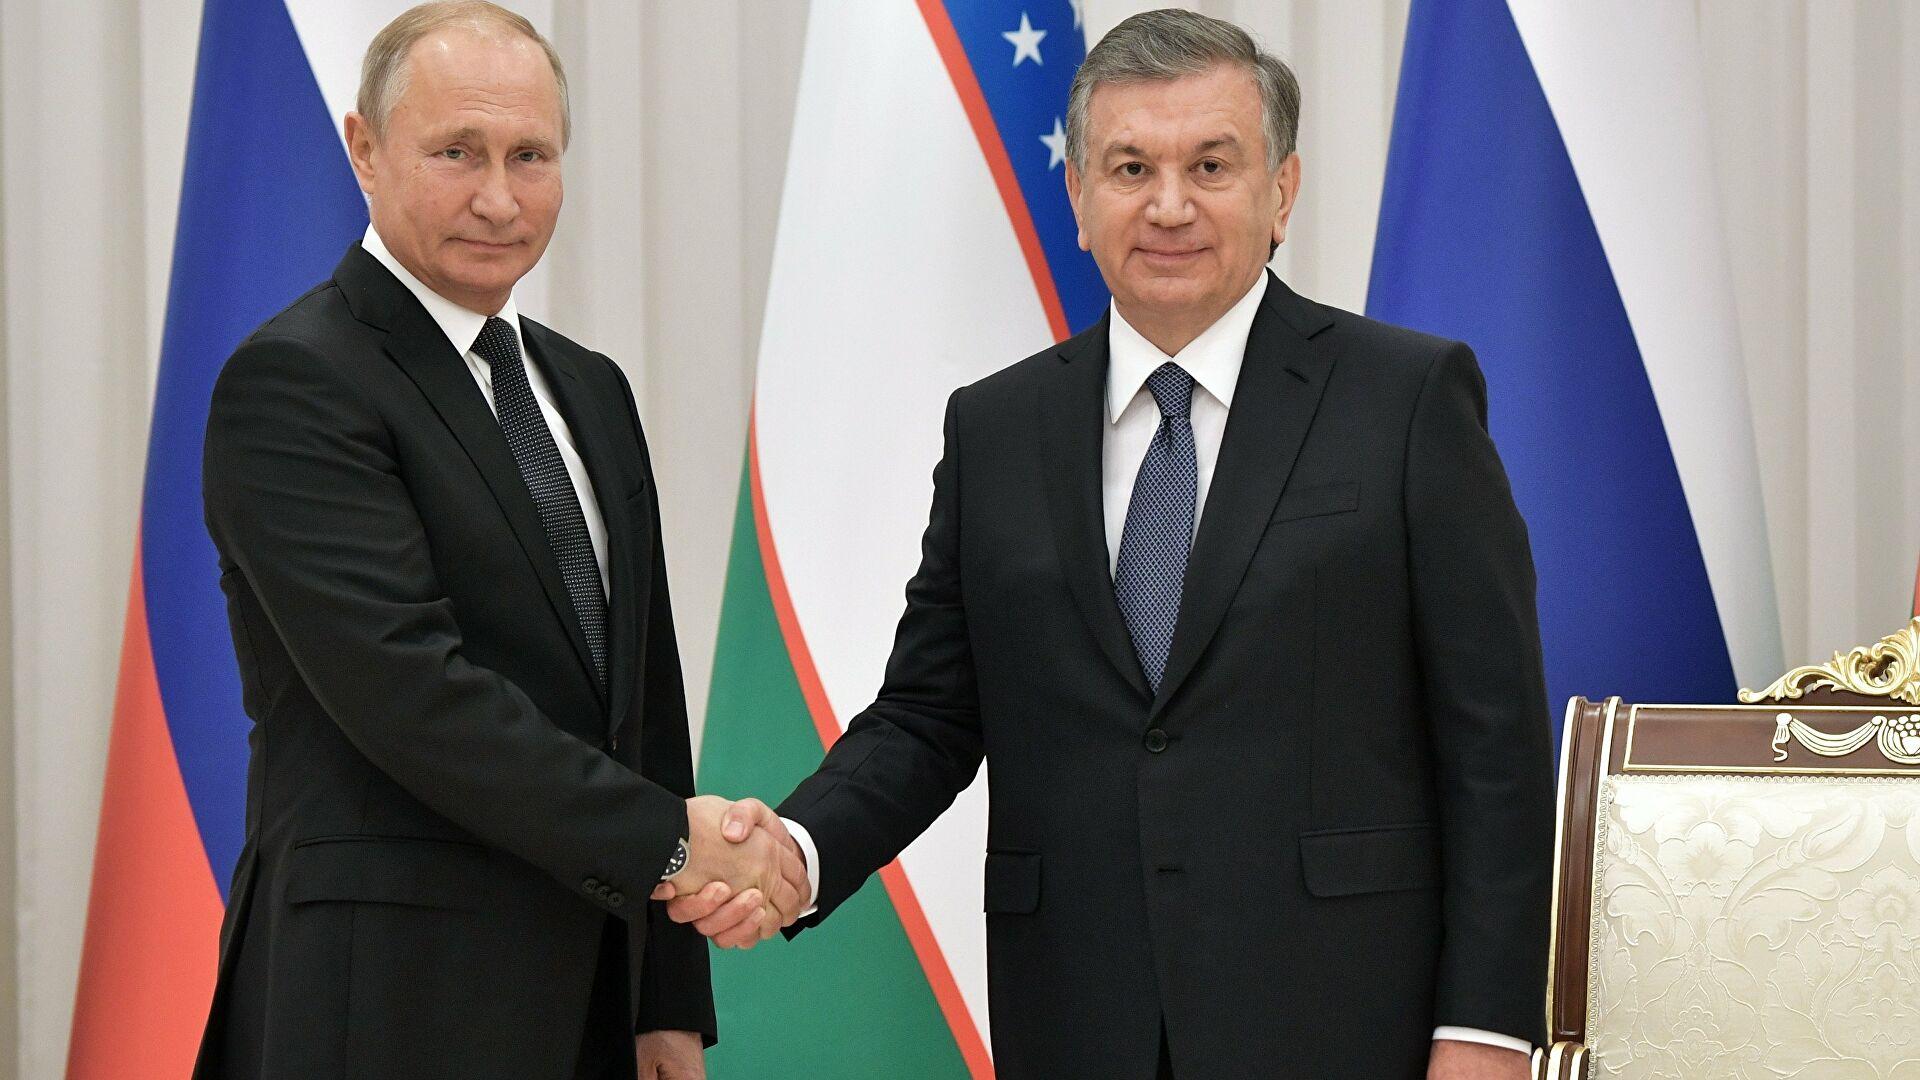 Шавкат Мирзиёев и Владимир Путин обсудили ситуацию с Афганистаном